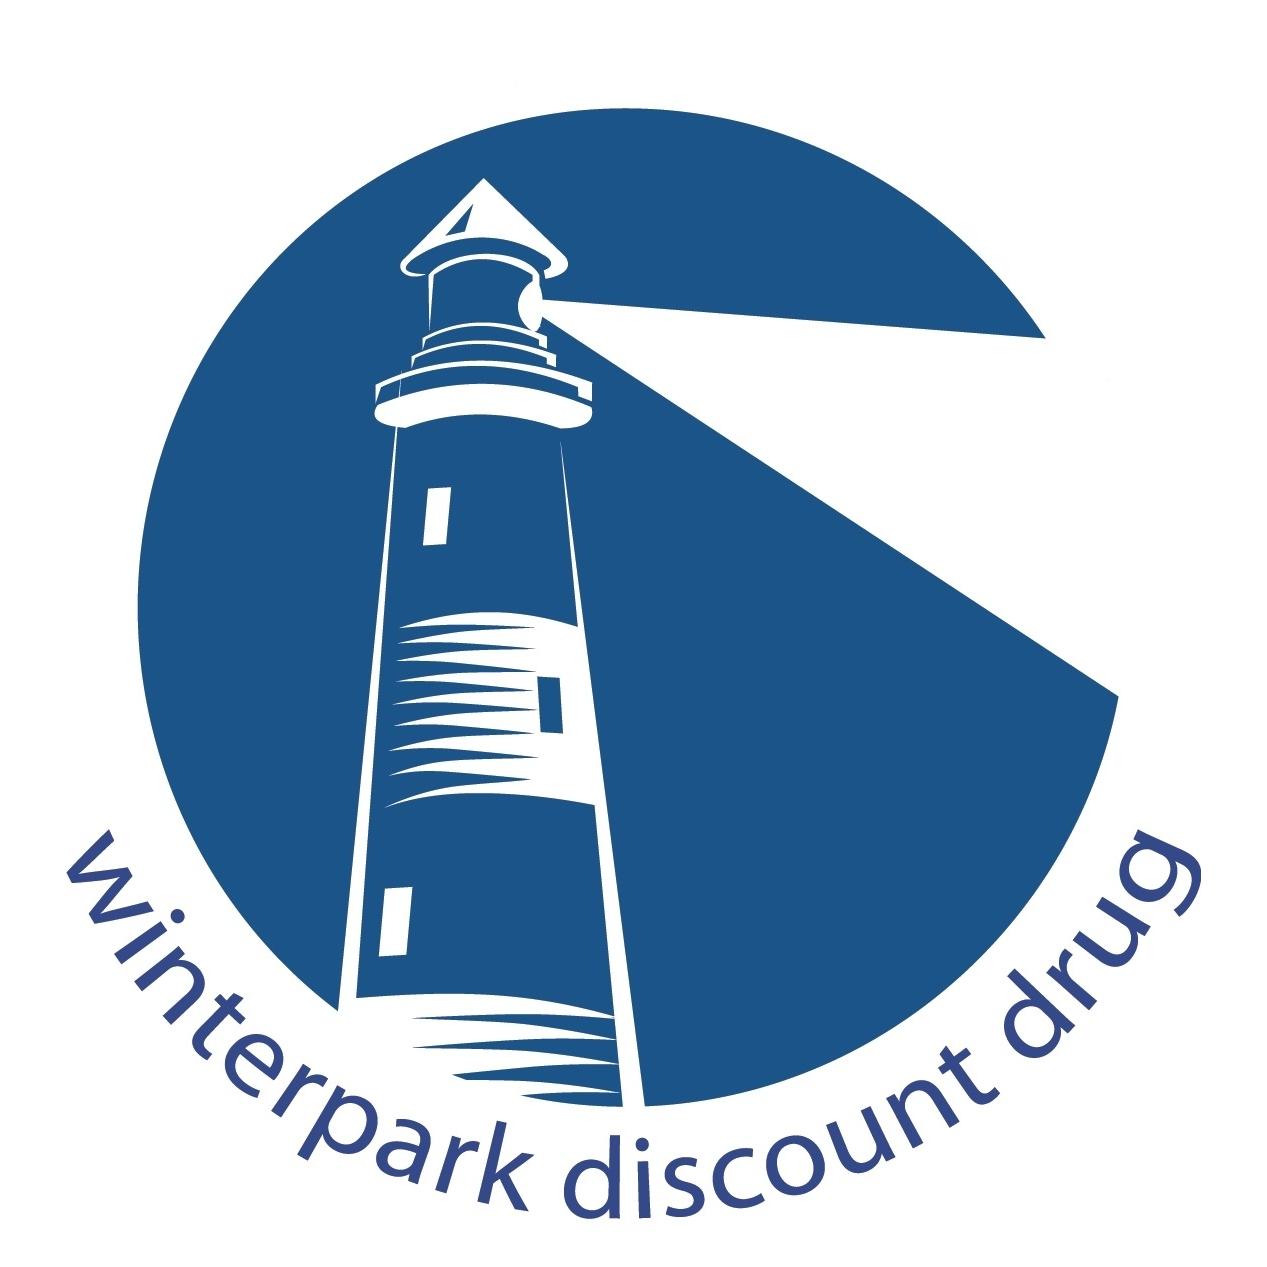 Winter Park Drugs, Inc. image 1